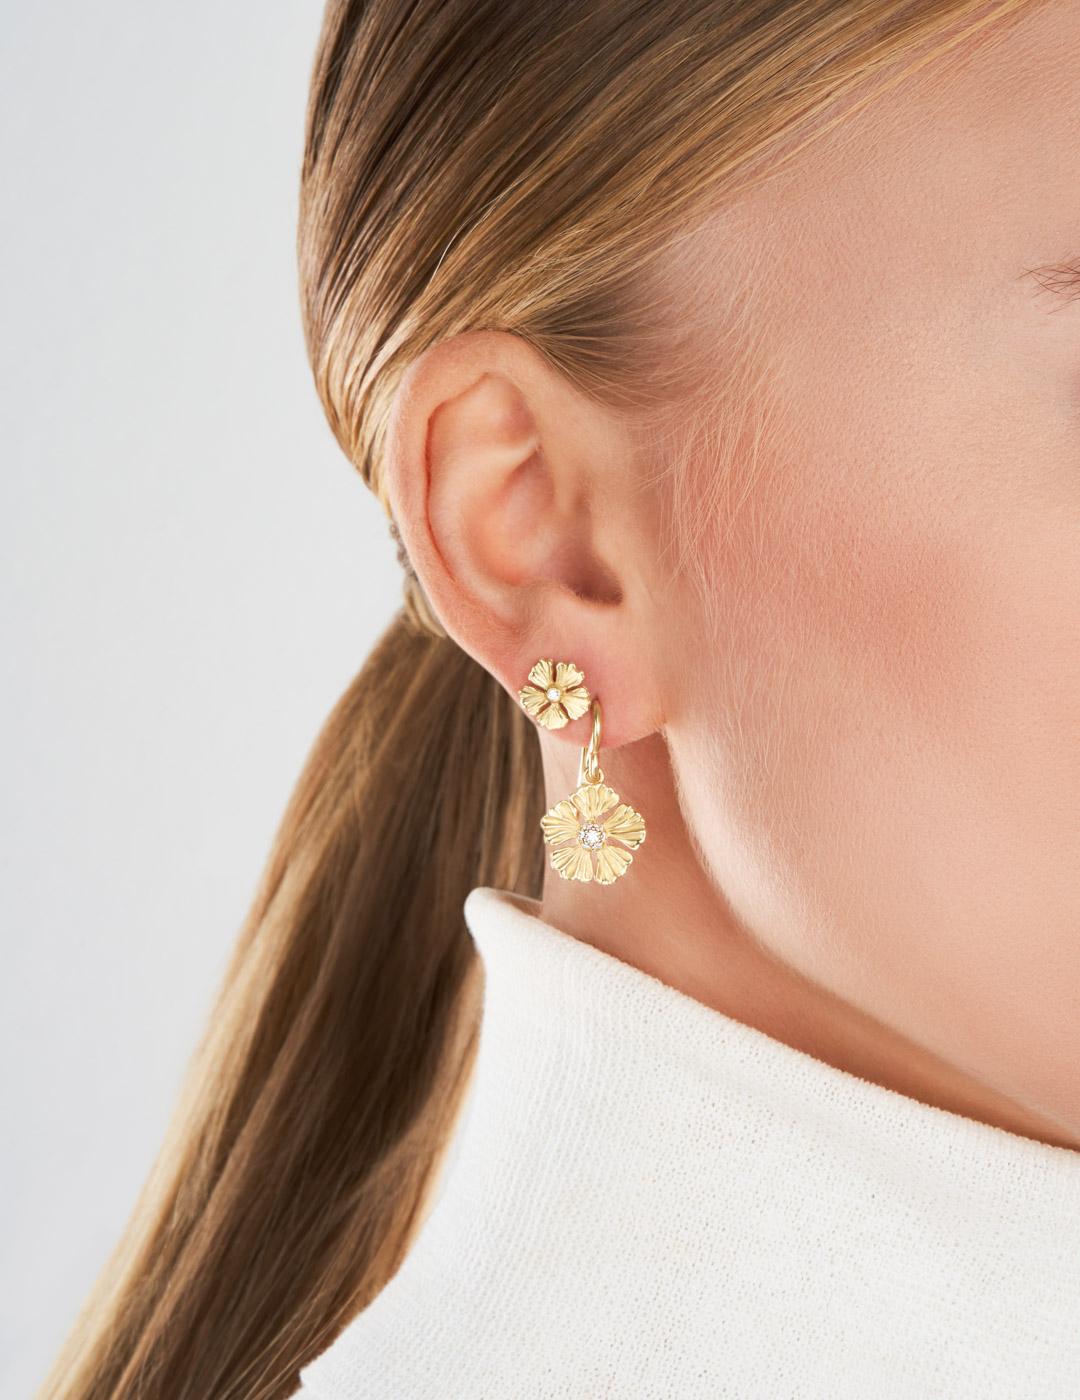 mish_products_earrings_StrwFlwer-XL-FW-3